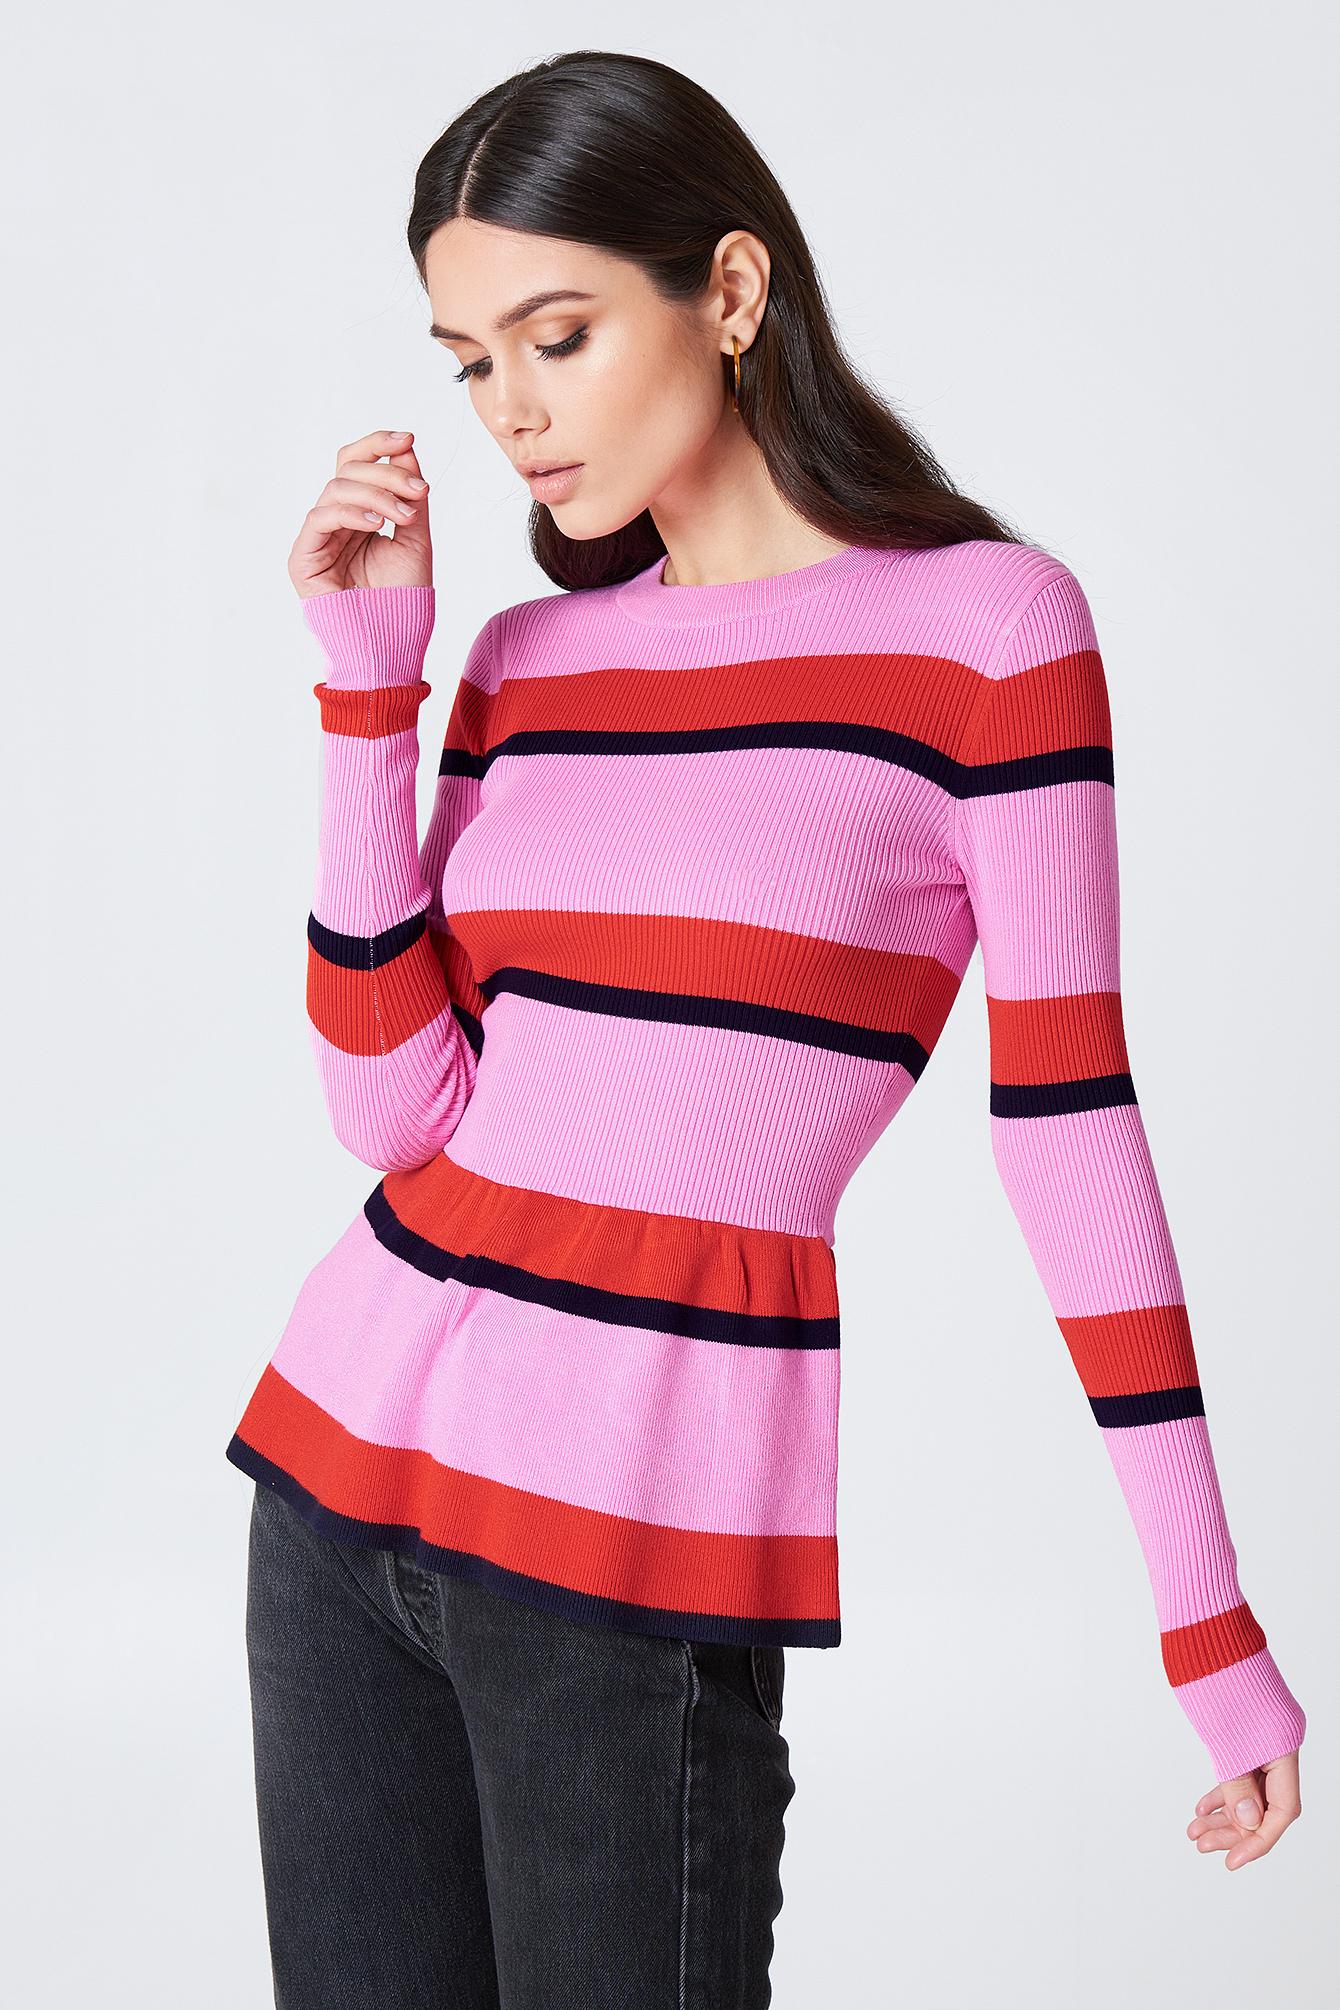 MBYM Mindy Knit - Pink, Multicolor in Pink,Multicolor